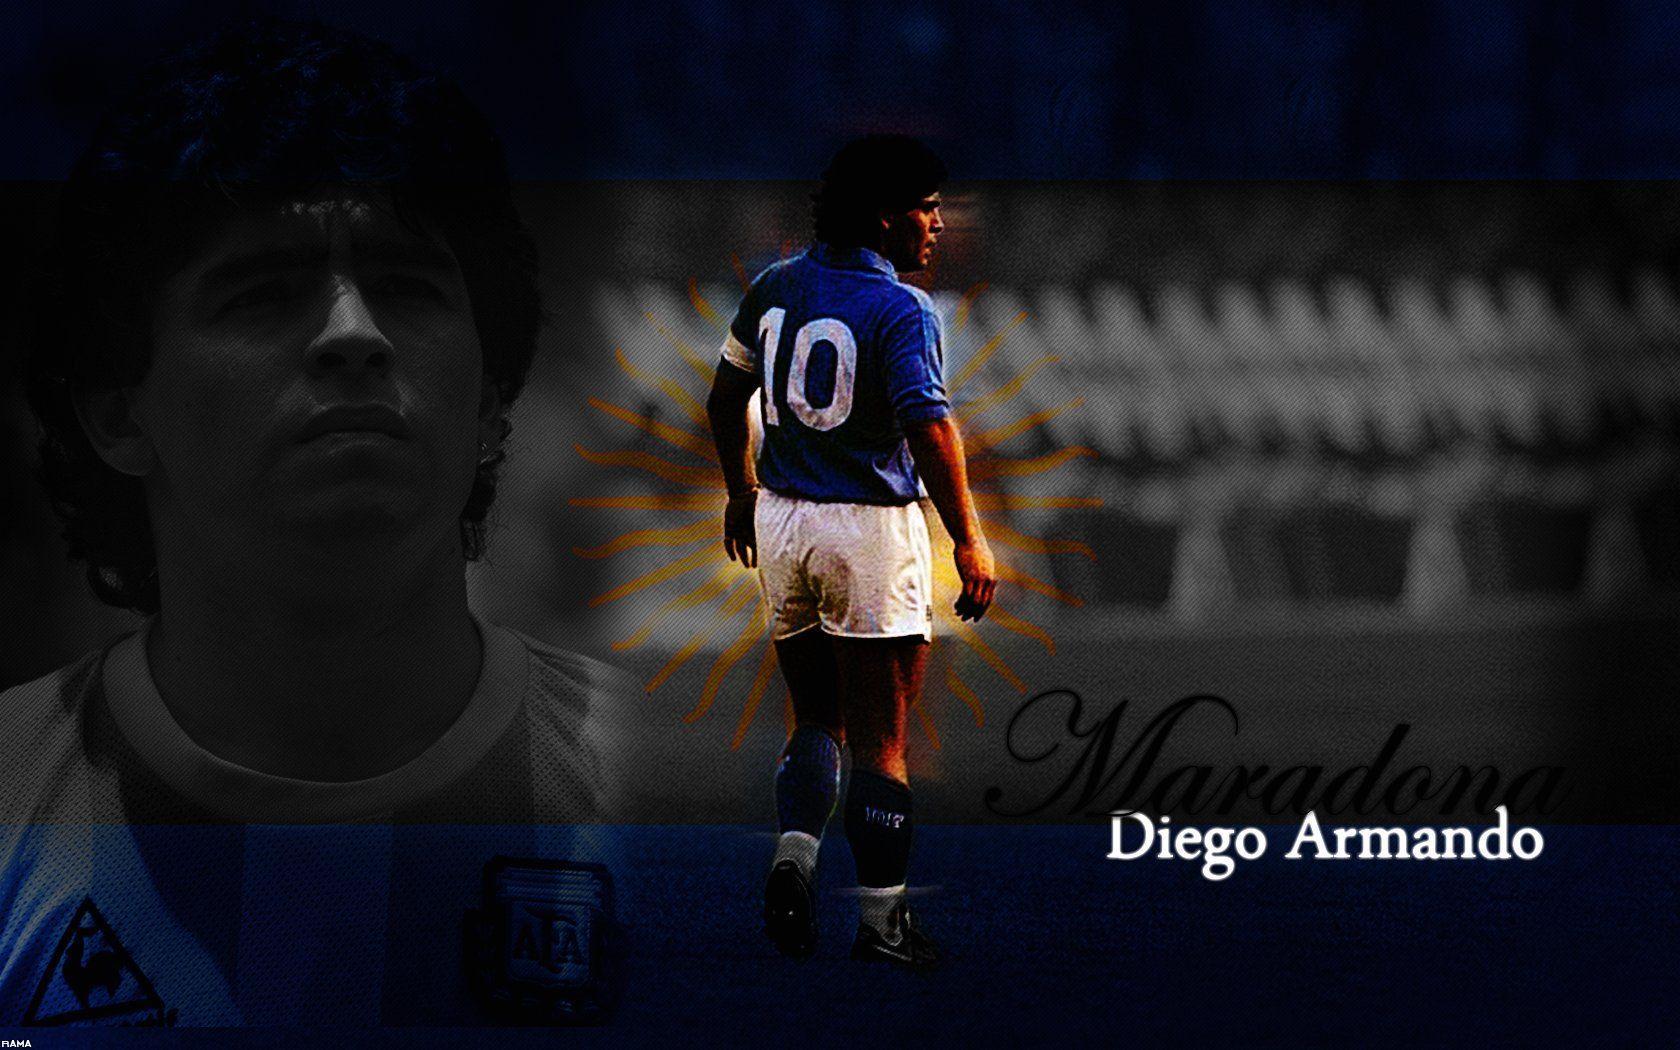 Diego Maradona Wallpapers Top Free Diego Maradona Backgrounds Wallpaperaccess